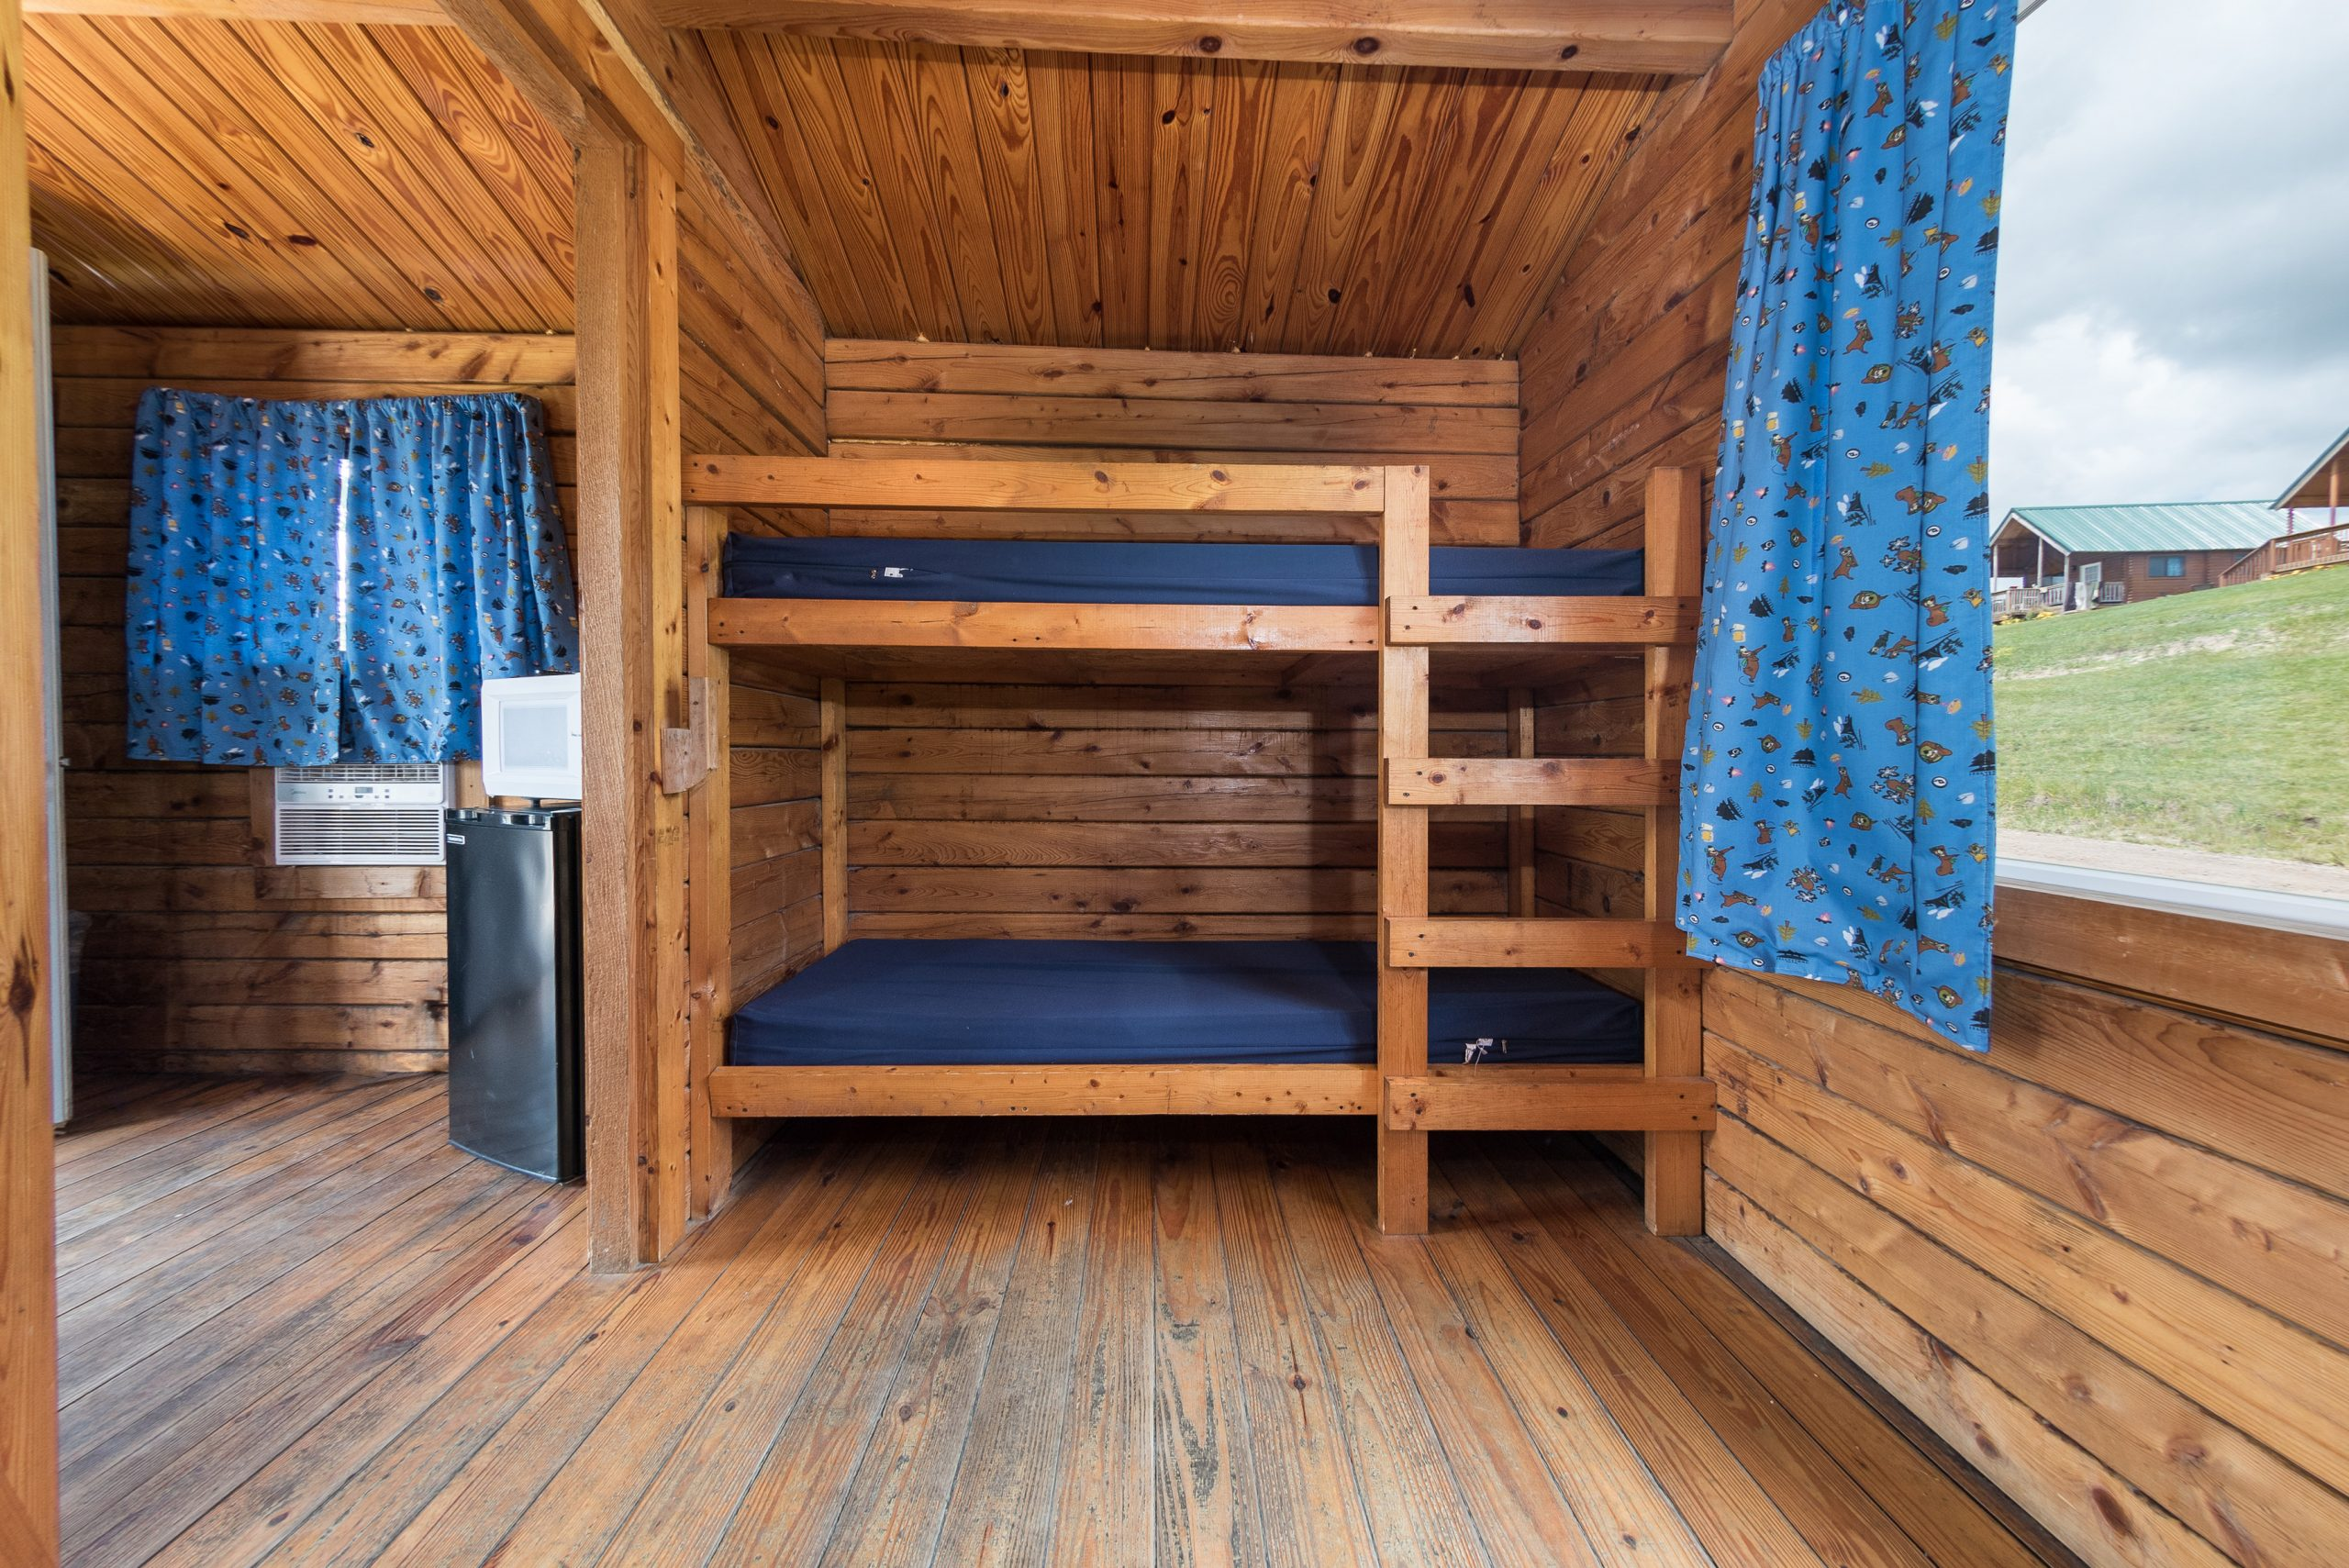 165 yogi bear campground 20200623 at RV park Sioux Falls SD